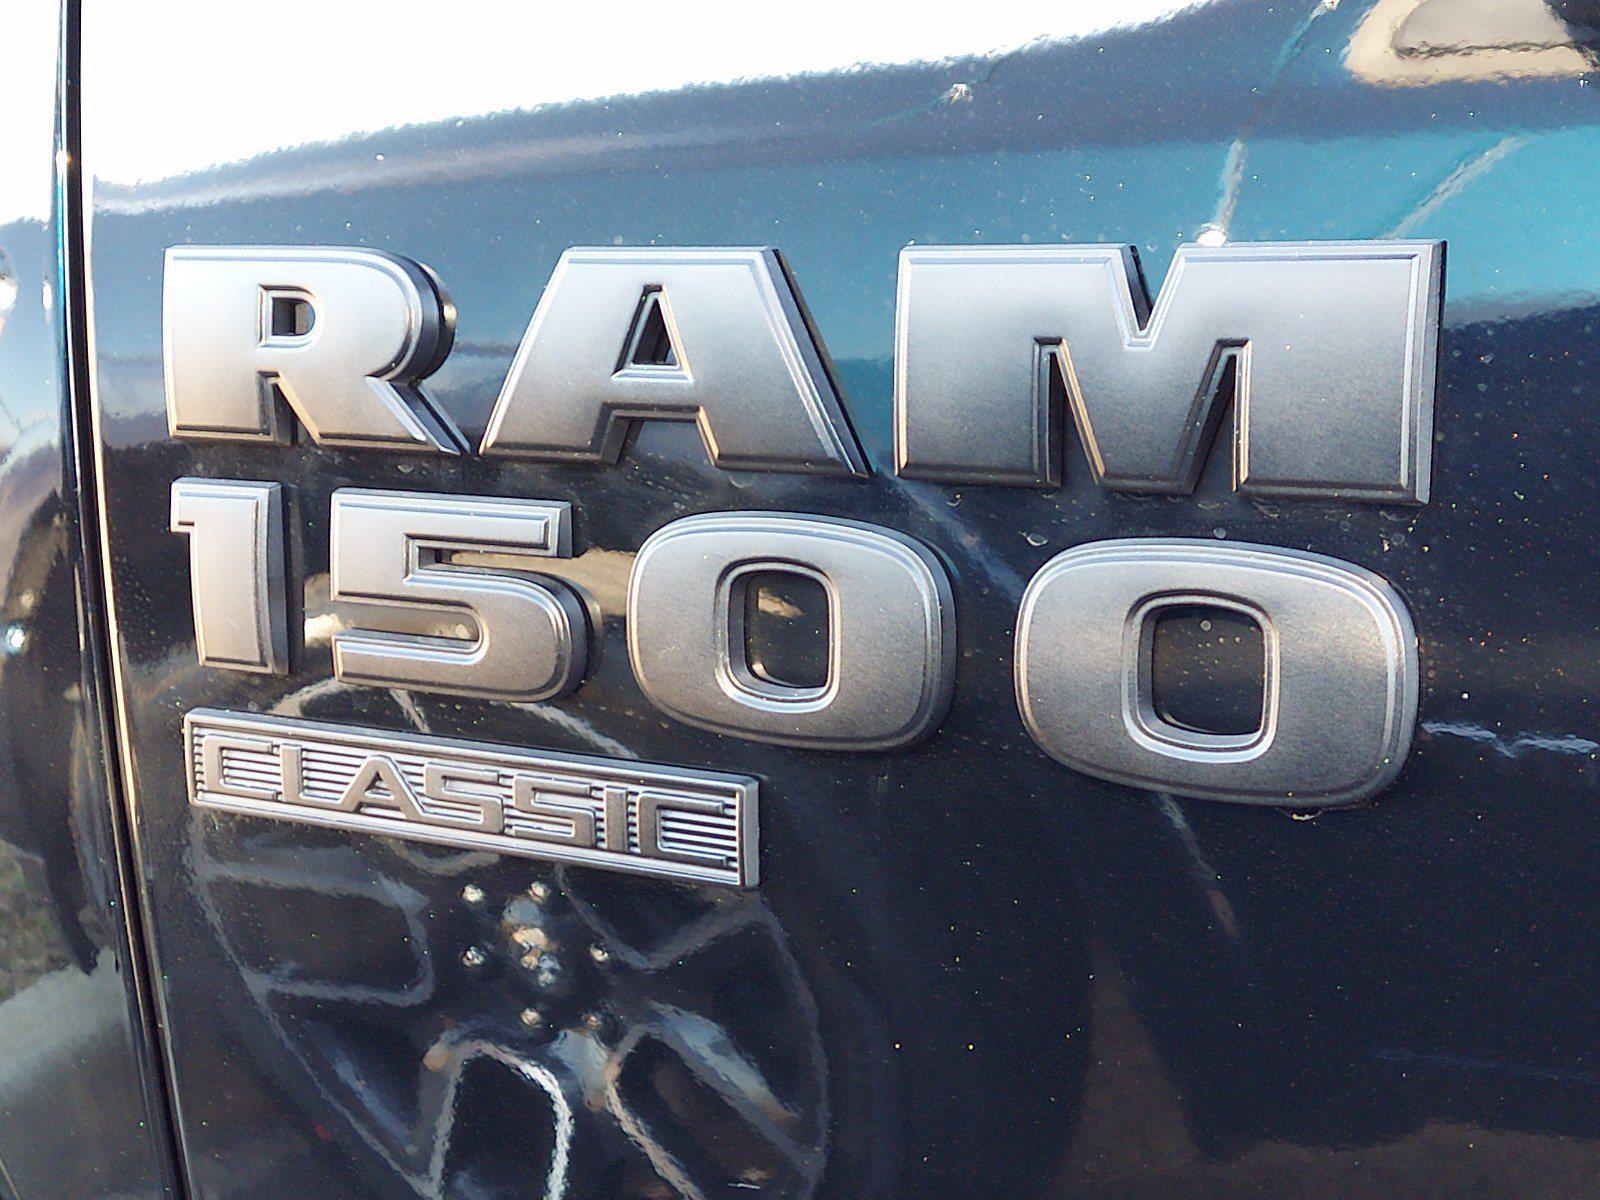 2021 Ram 1500 Quad Cab 4x4, Pickup #CM143 - photo 9